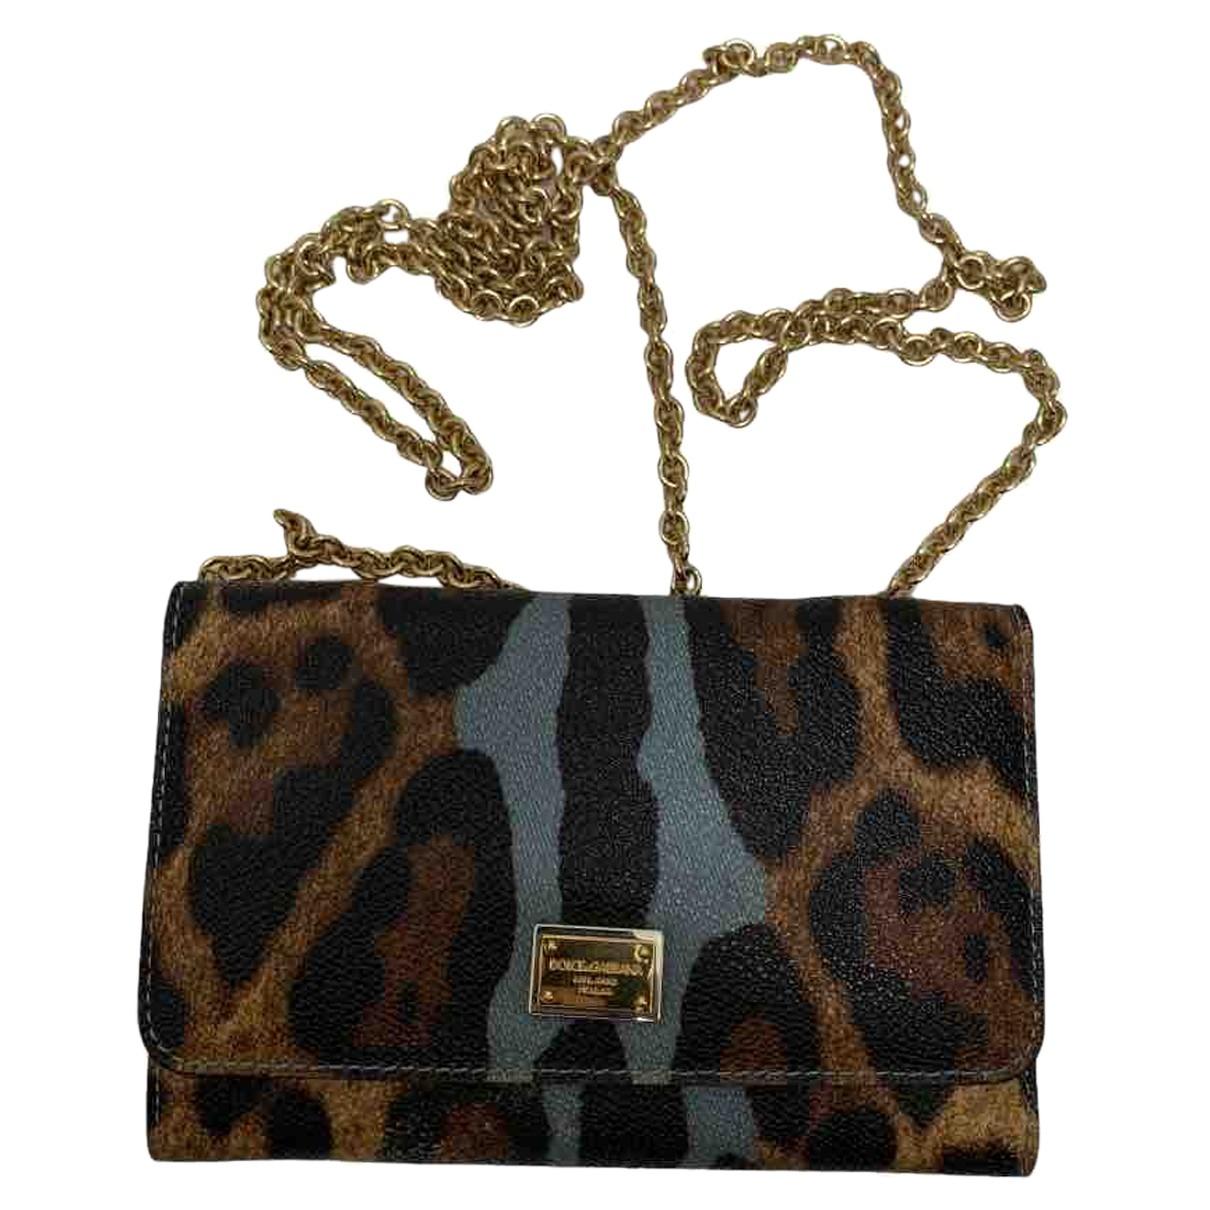 Dolce & Gabbana N Leather handbag for Women N